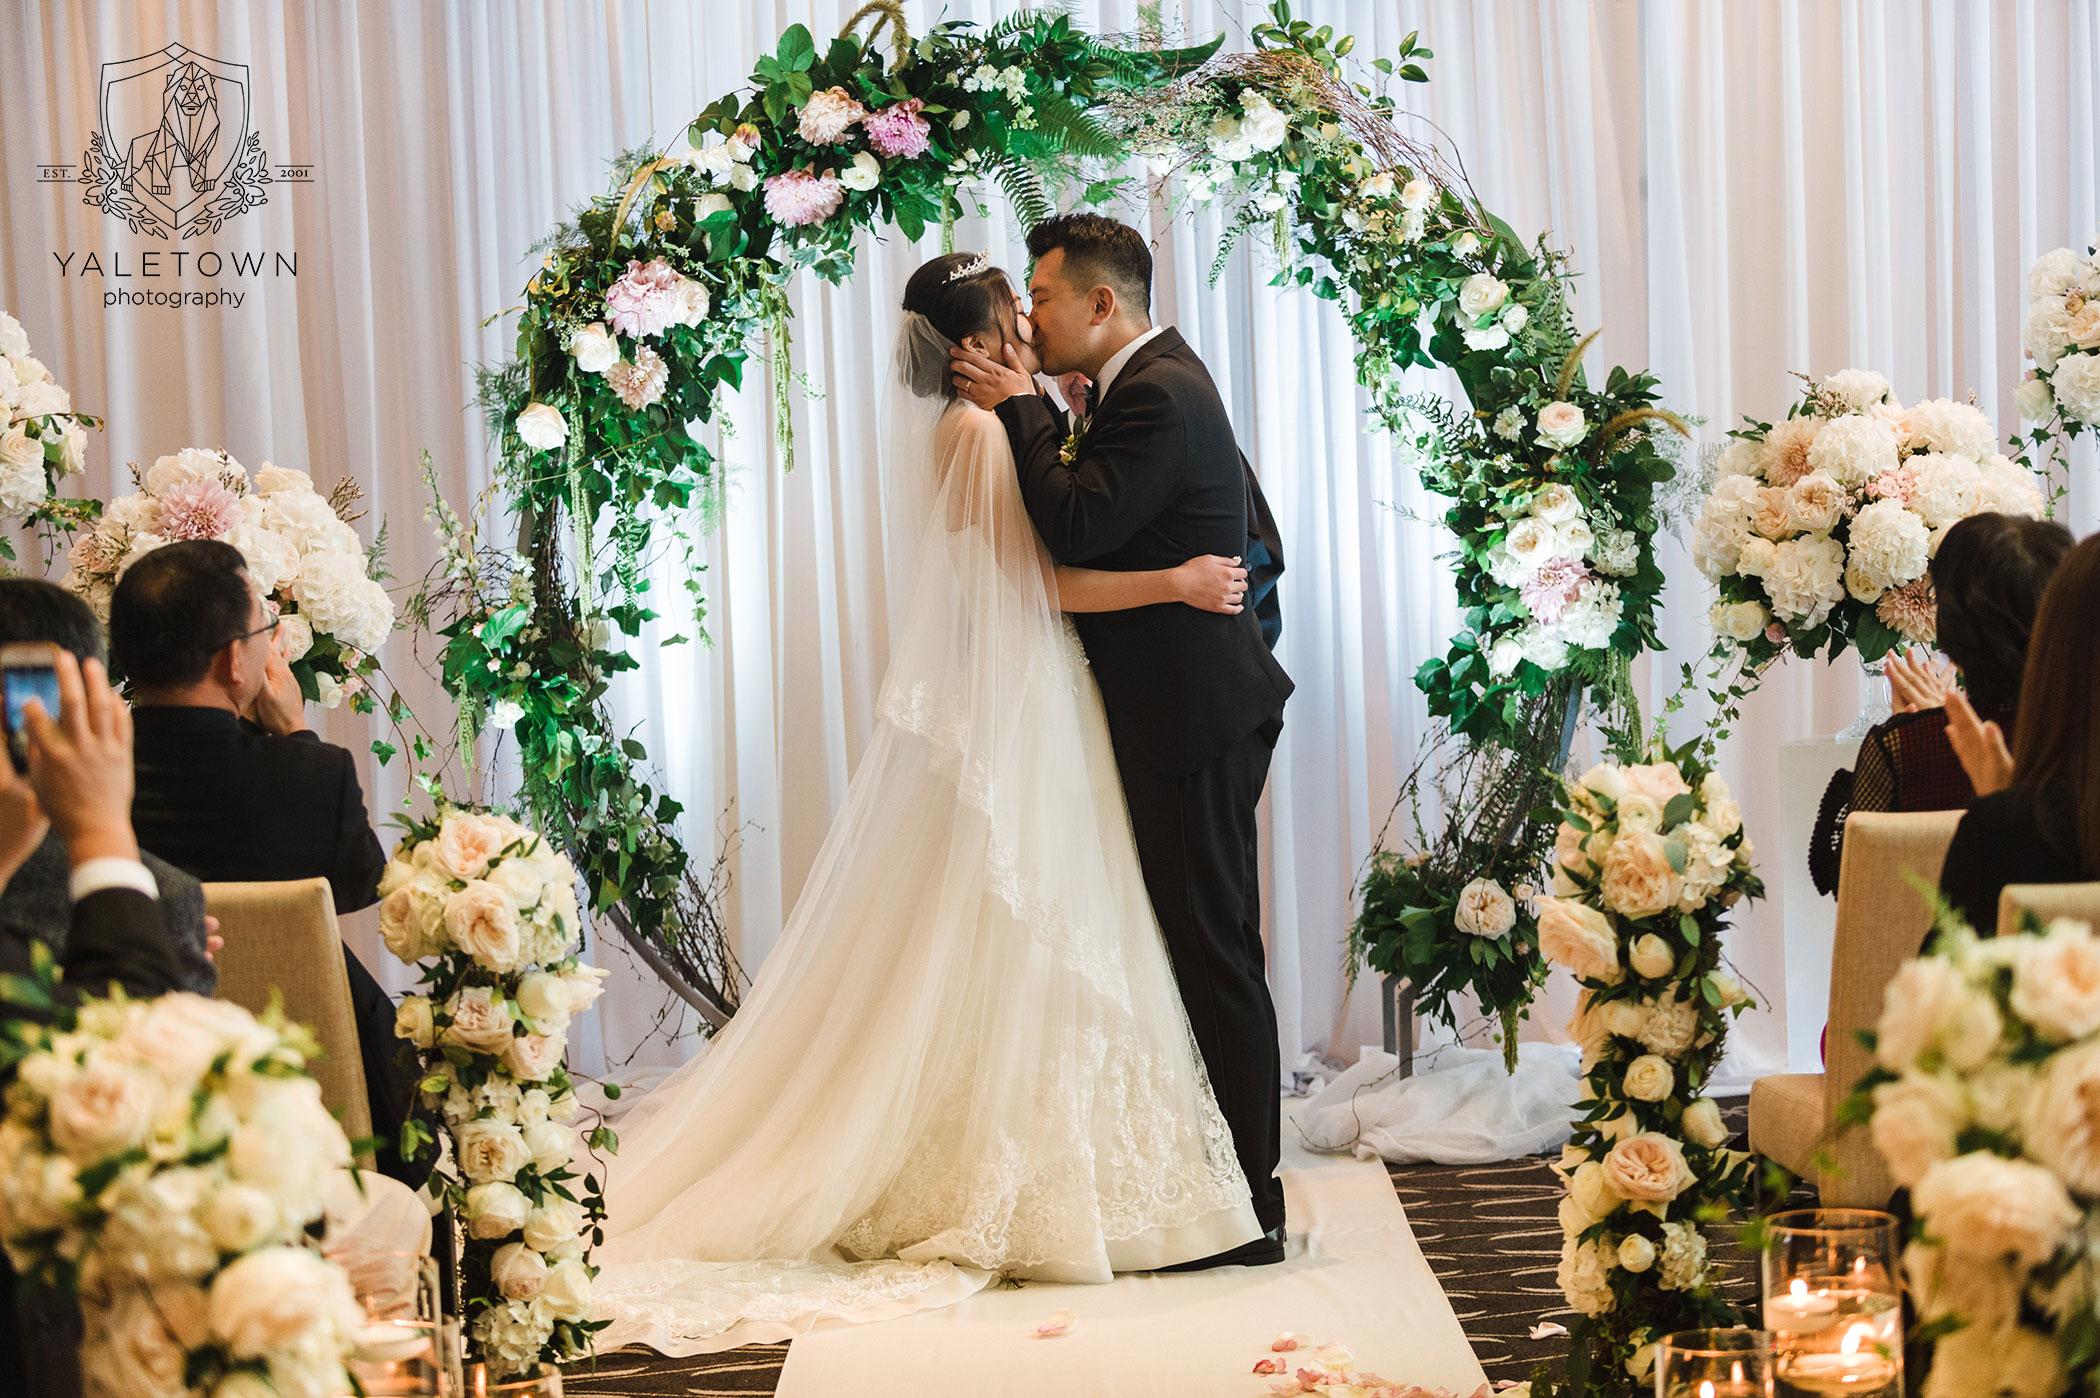 Rosewood-Hotel-Georgia-Vancouver-Wedding-Yaletown-Photography-photo